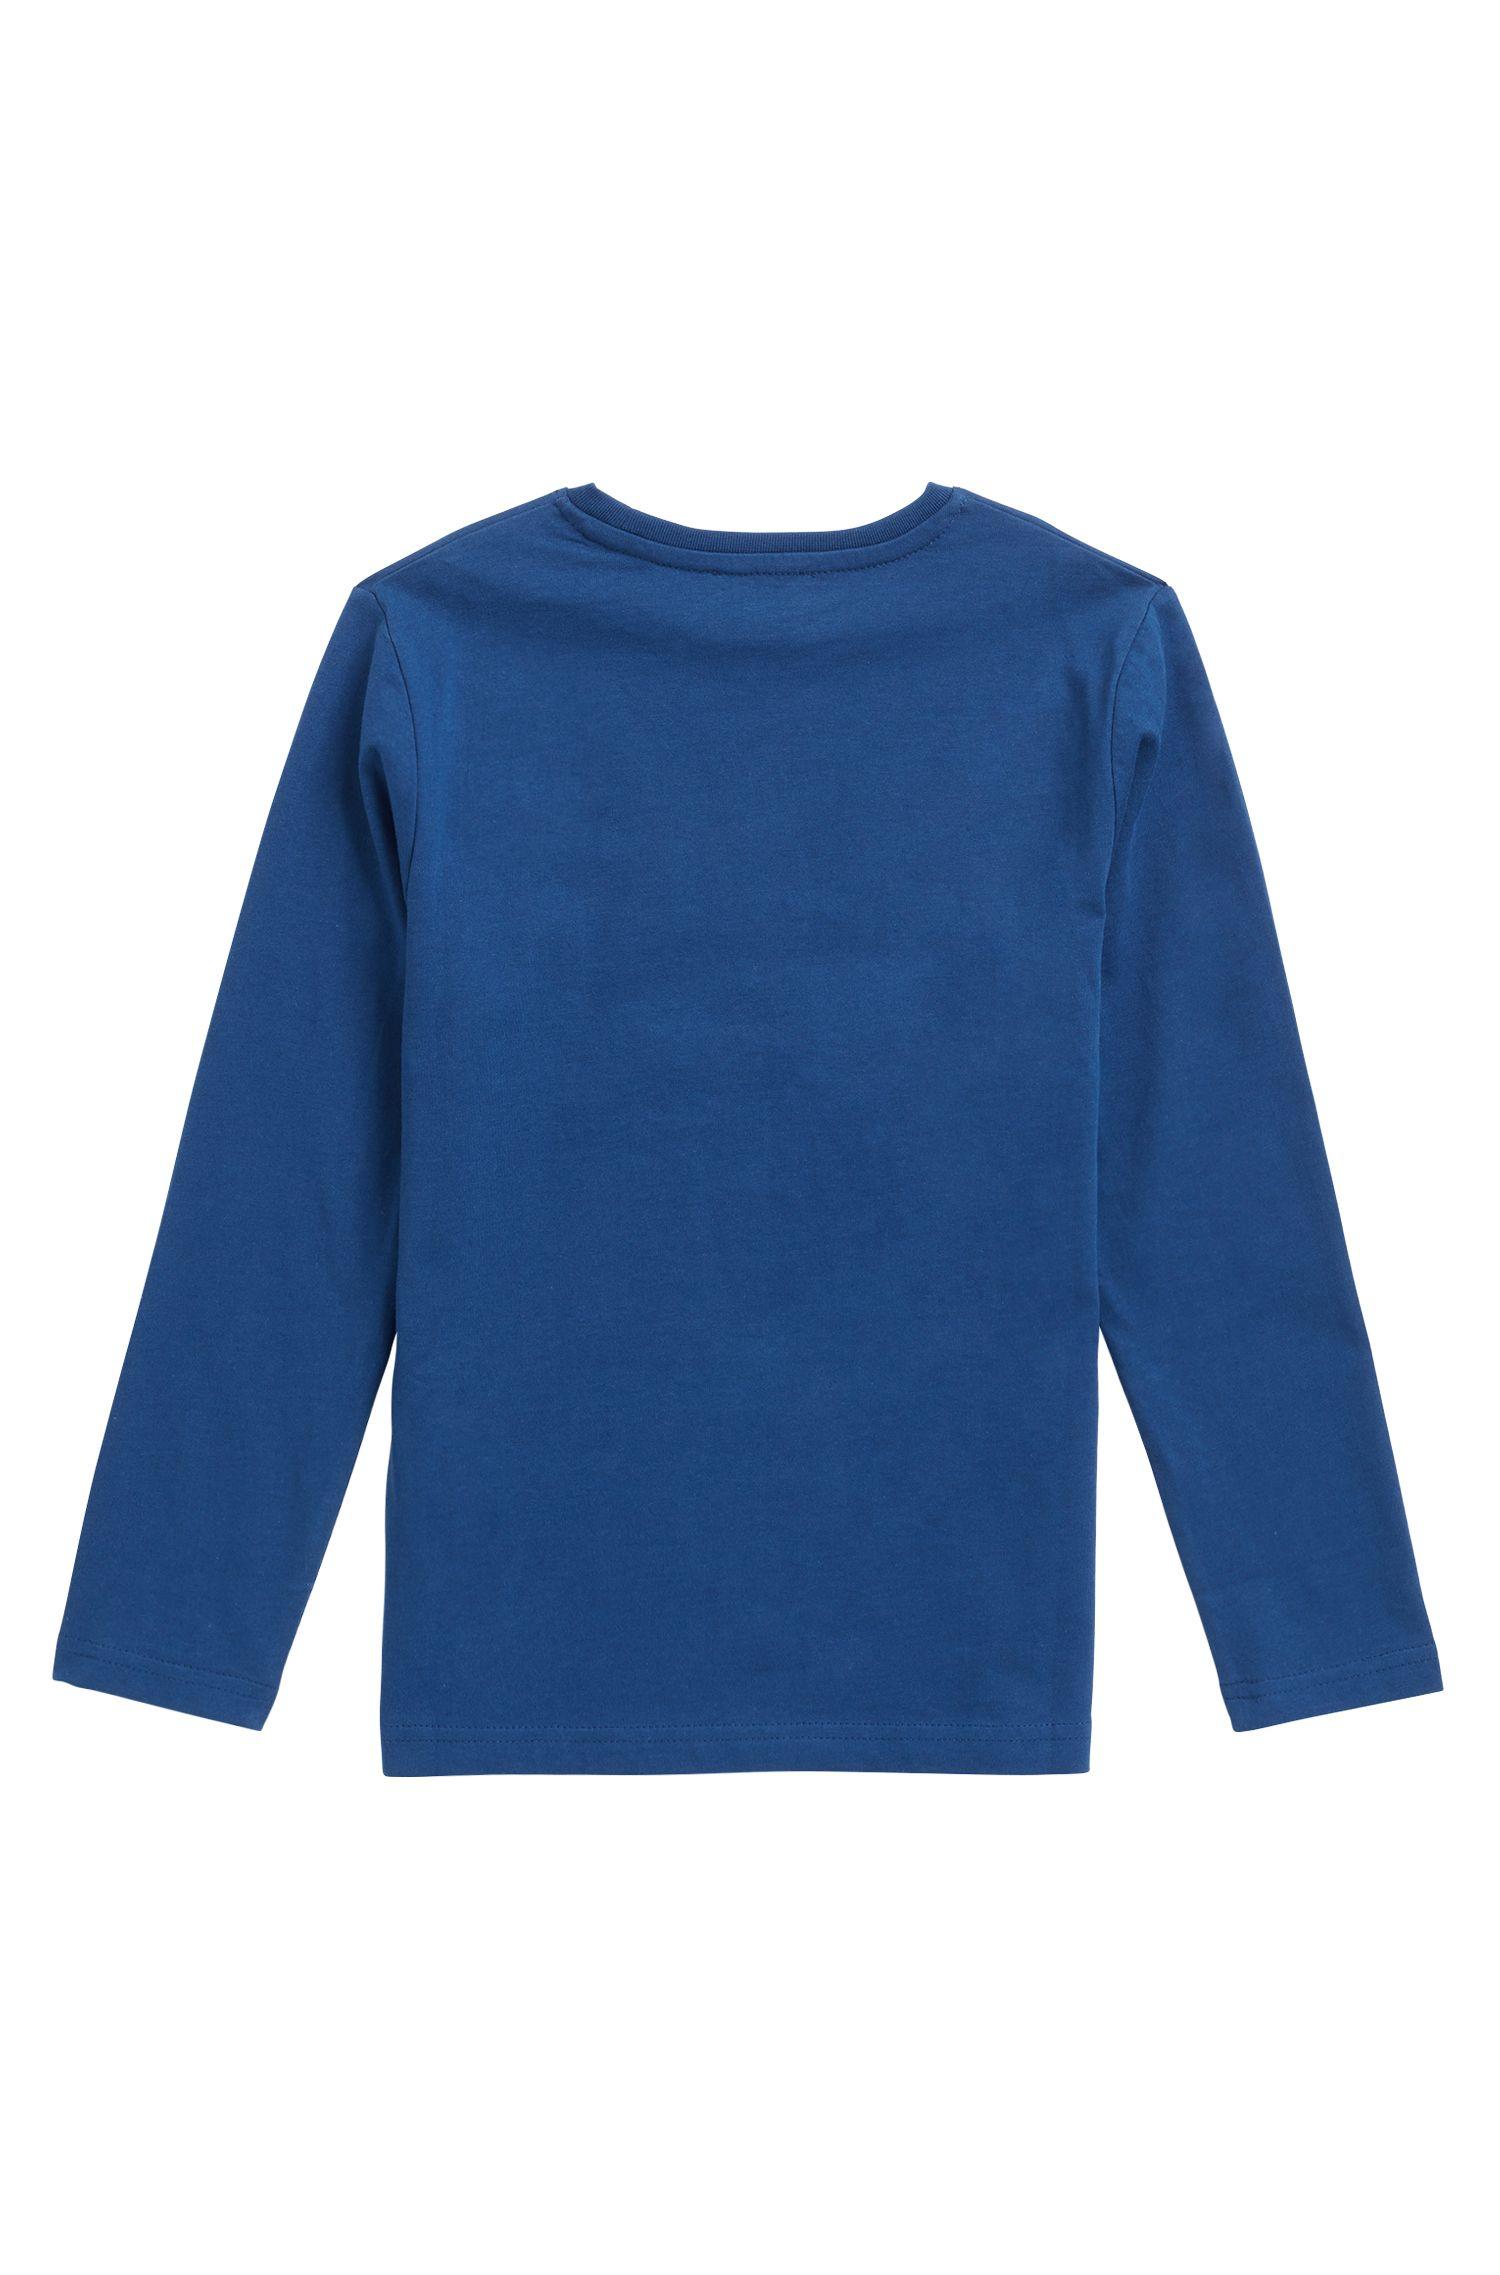 Camiseta de manga larga para niños en algodón con logo gráfico estampado, Azul